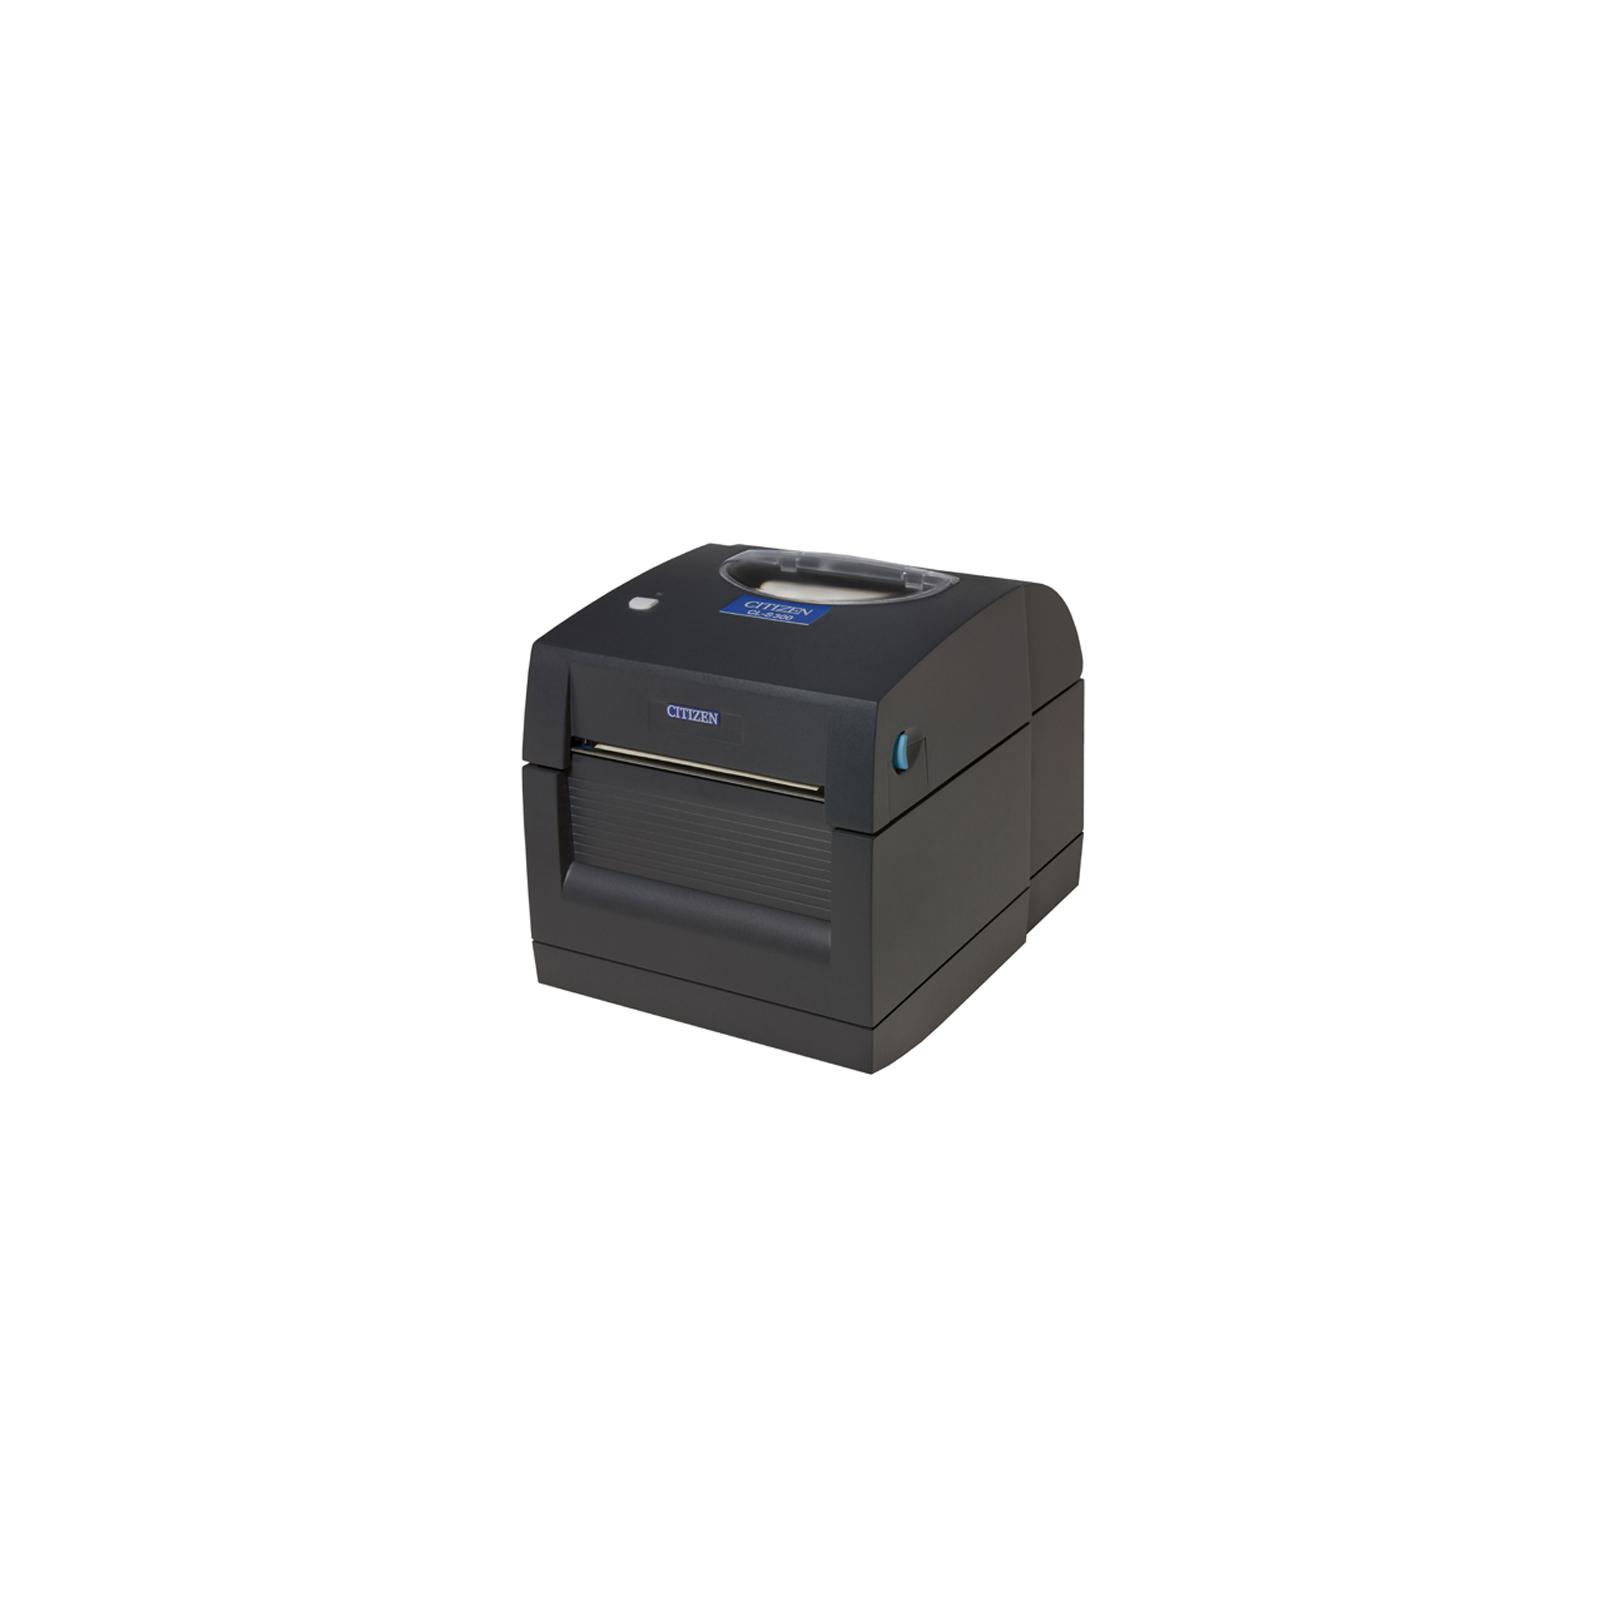 Принтер этикеток Citizen CL-S300 (1000837)